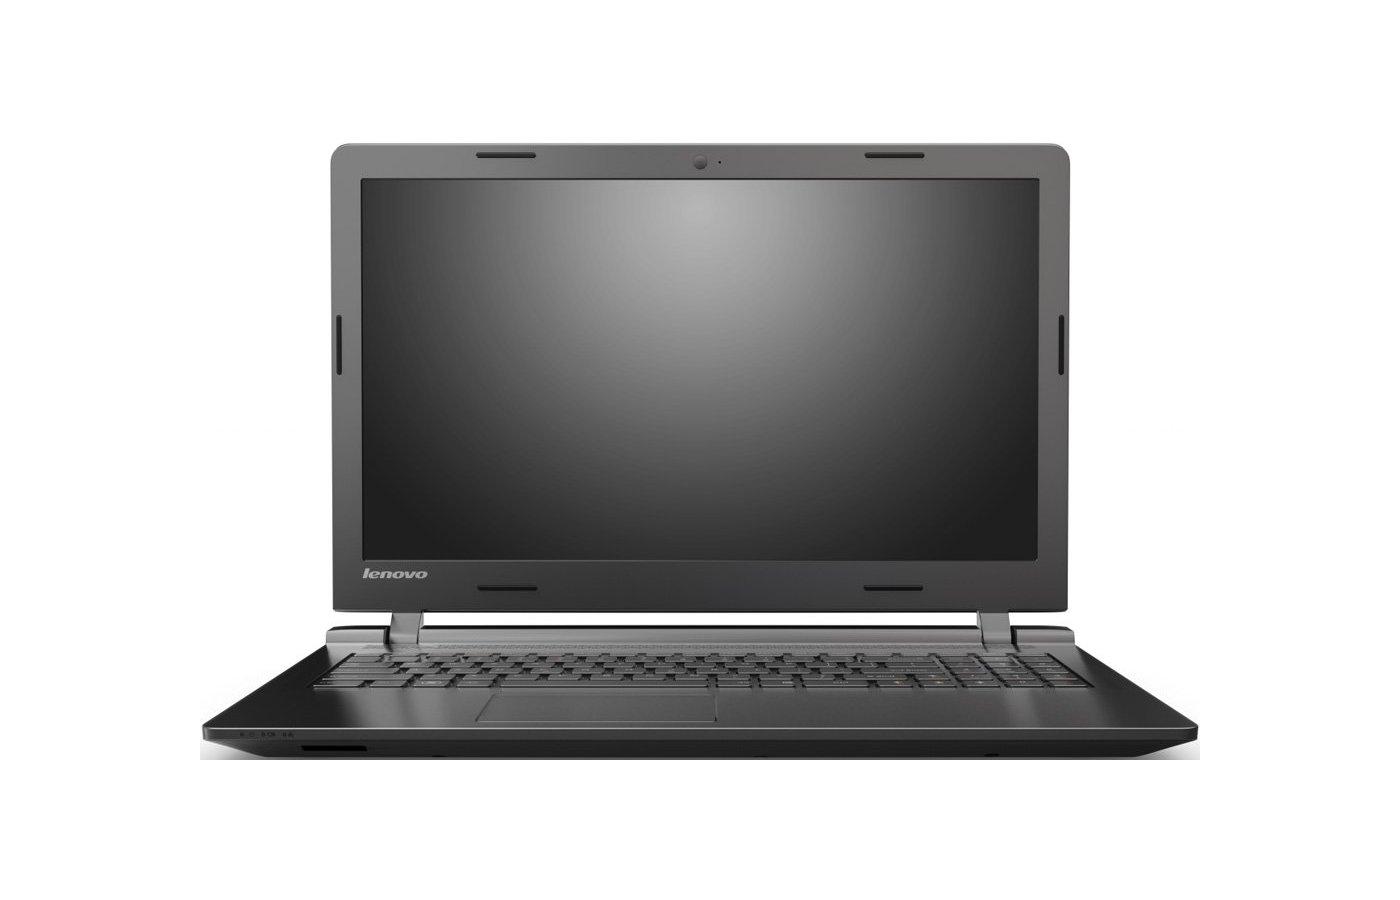 Ноутбук Lenovo IdeaPad B5010 /80QR004FRK/ intel N3540/2Gb/500Gb/15.6/Win10